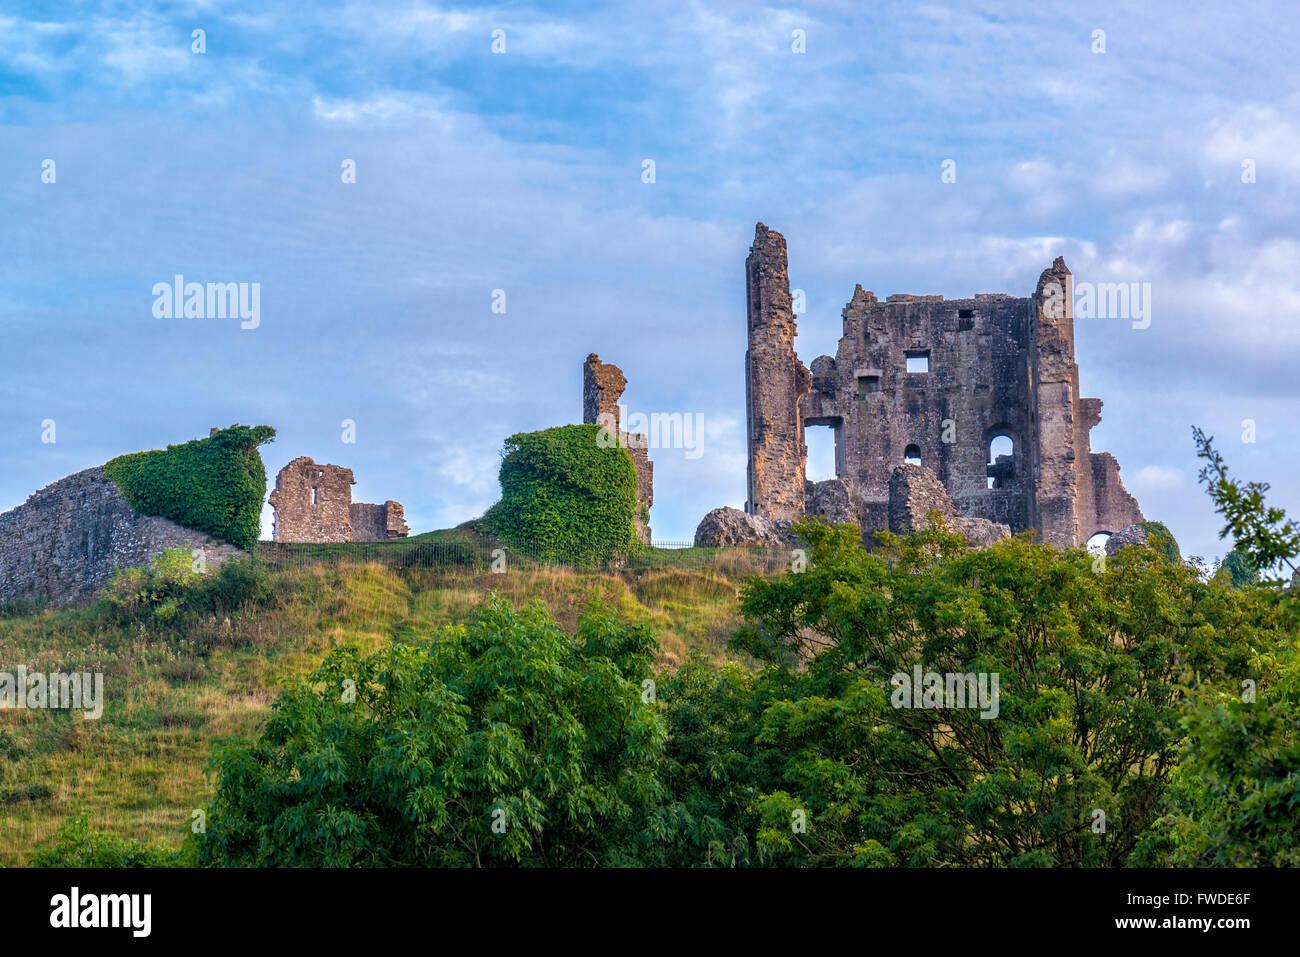 Corfe Castle, Dorset, UK - Stock Image